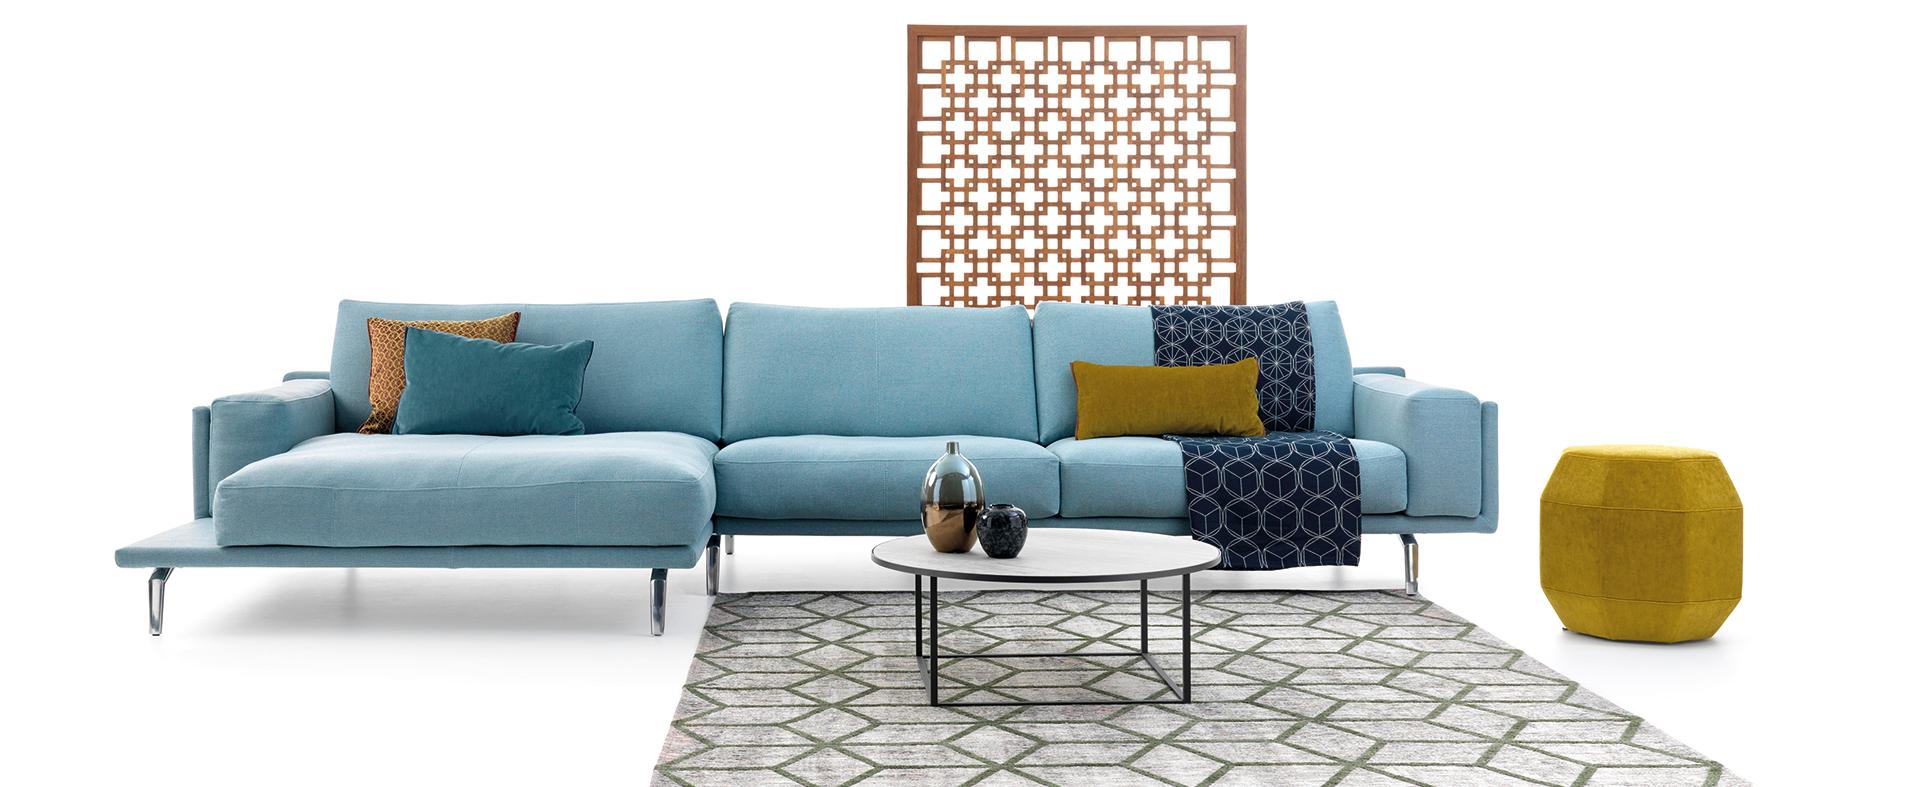 design sofas design sofa bellice by leolux UYTIJXY